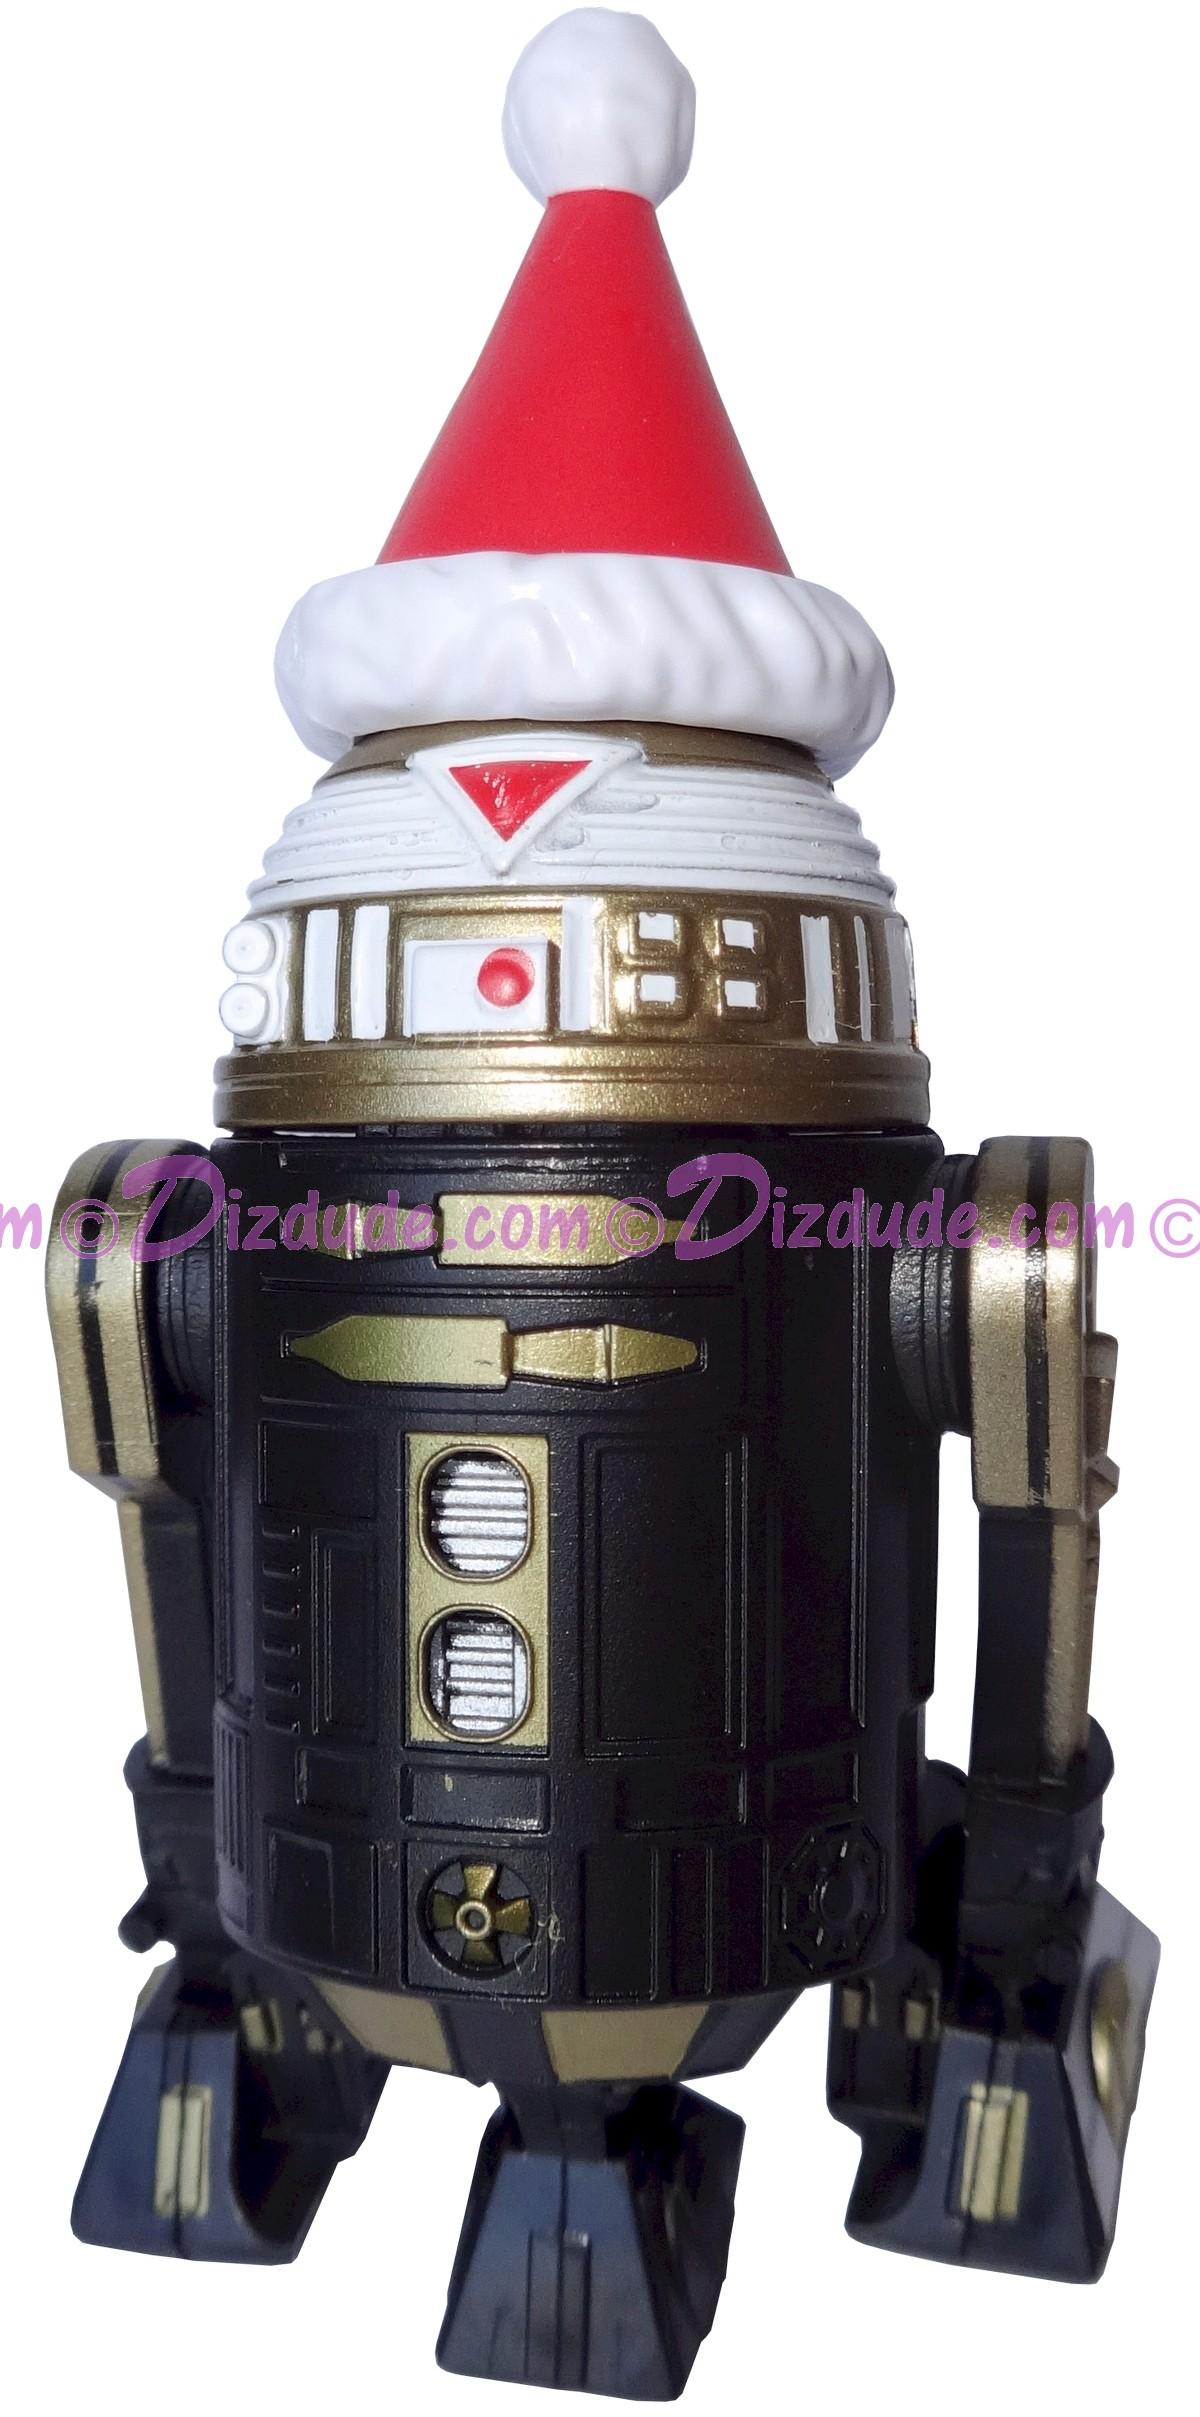 Christmas Black & Gold R7 with Santa Hat Astromech Droid ~ Series 2 Disney Star Wars Build-A-Droid Factory © DIZDUDE.COM